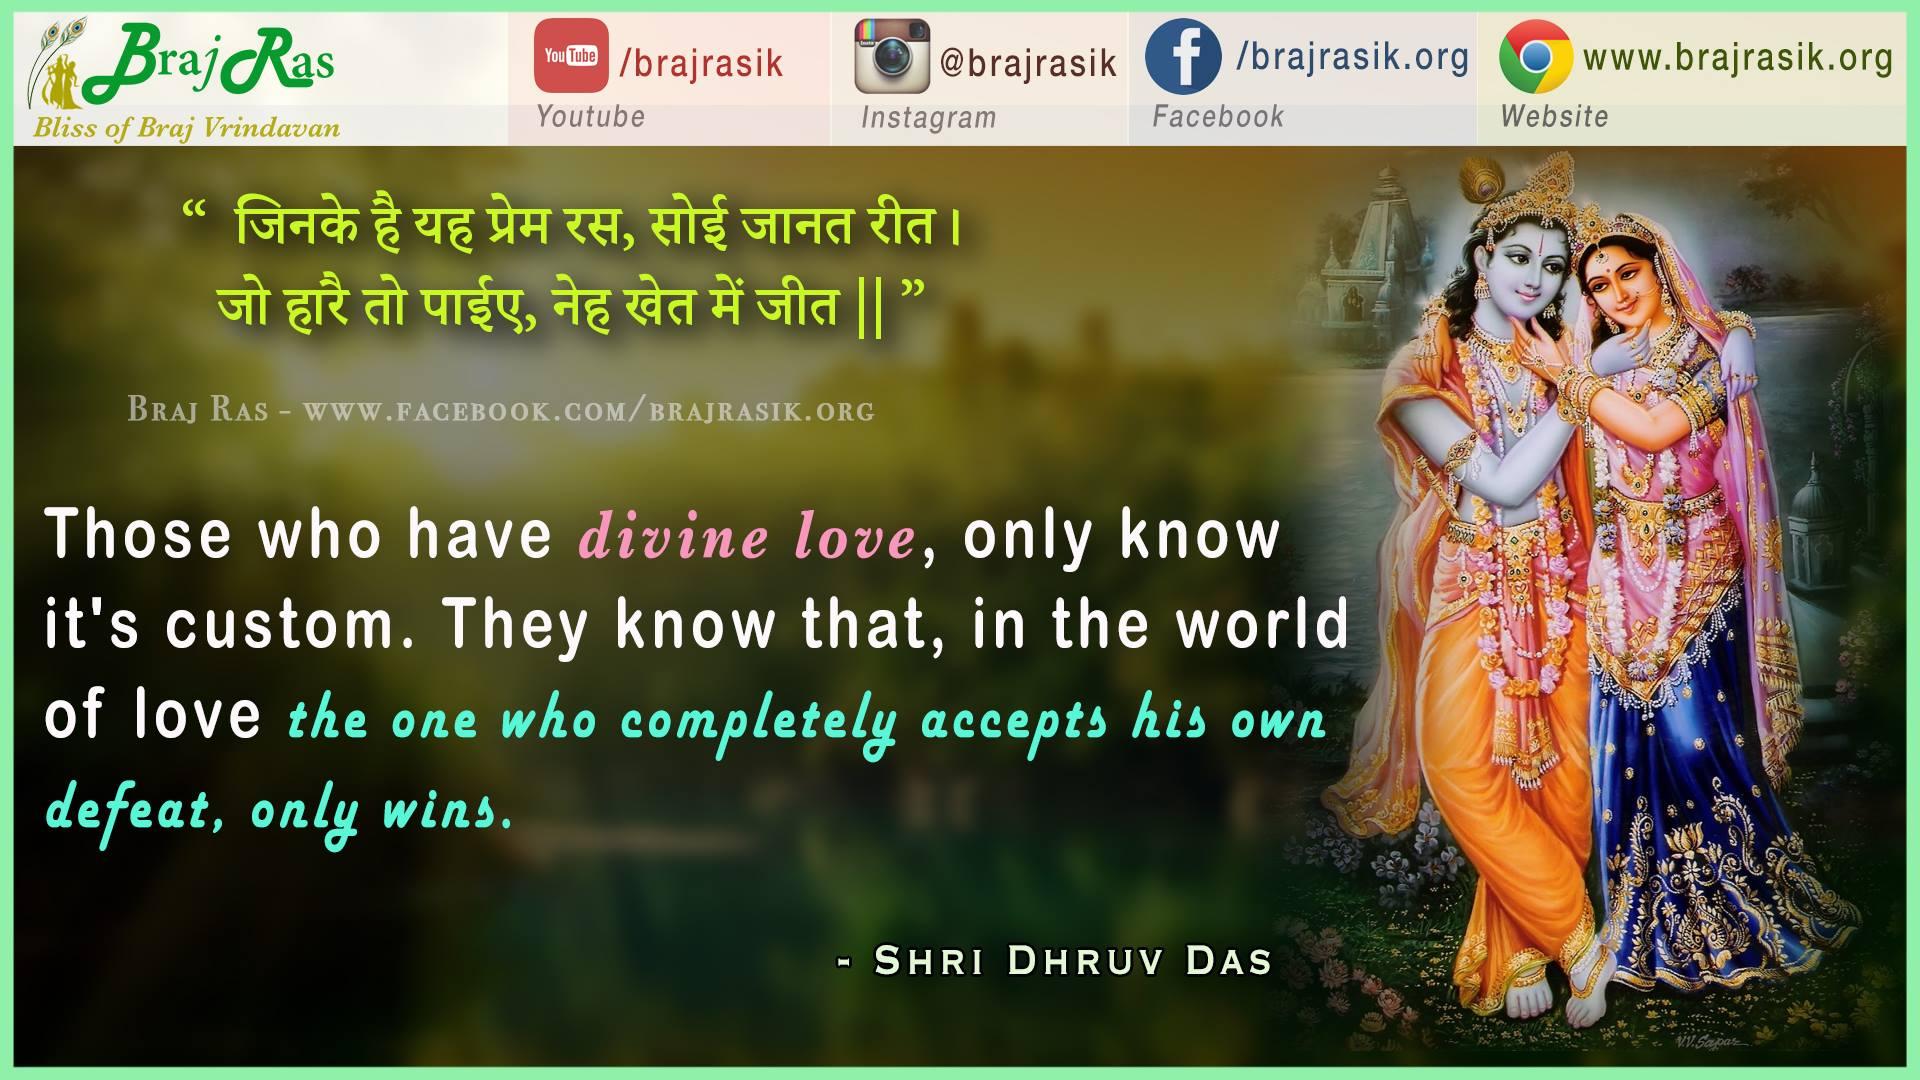 Jinke Hai Yeh Prem Ras - Shri Dhruv Das